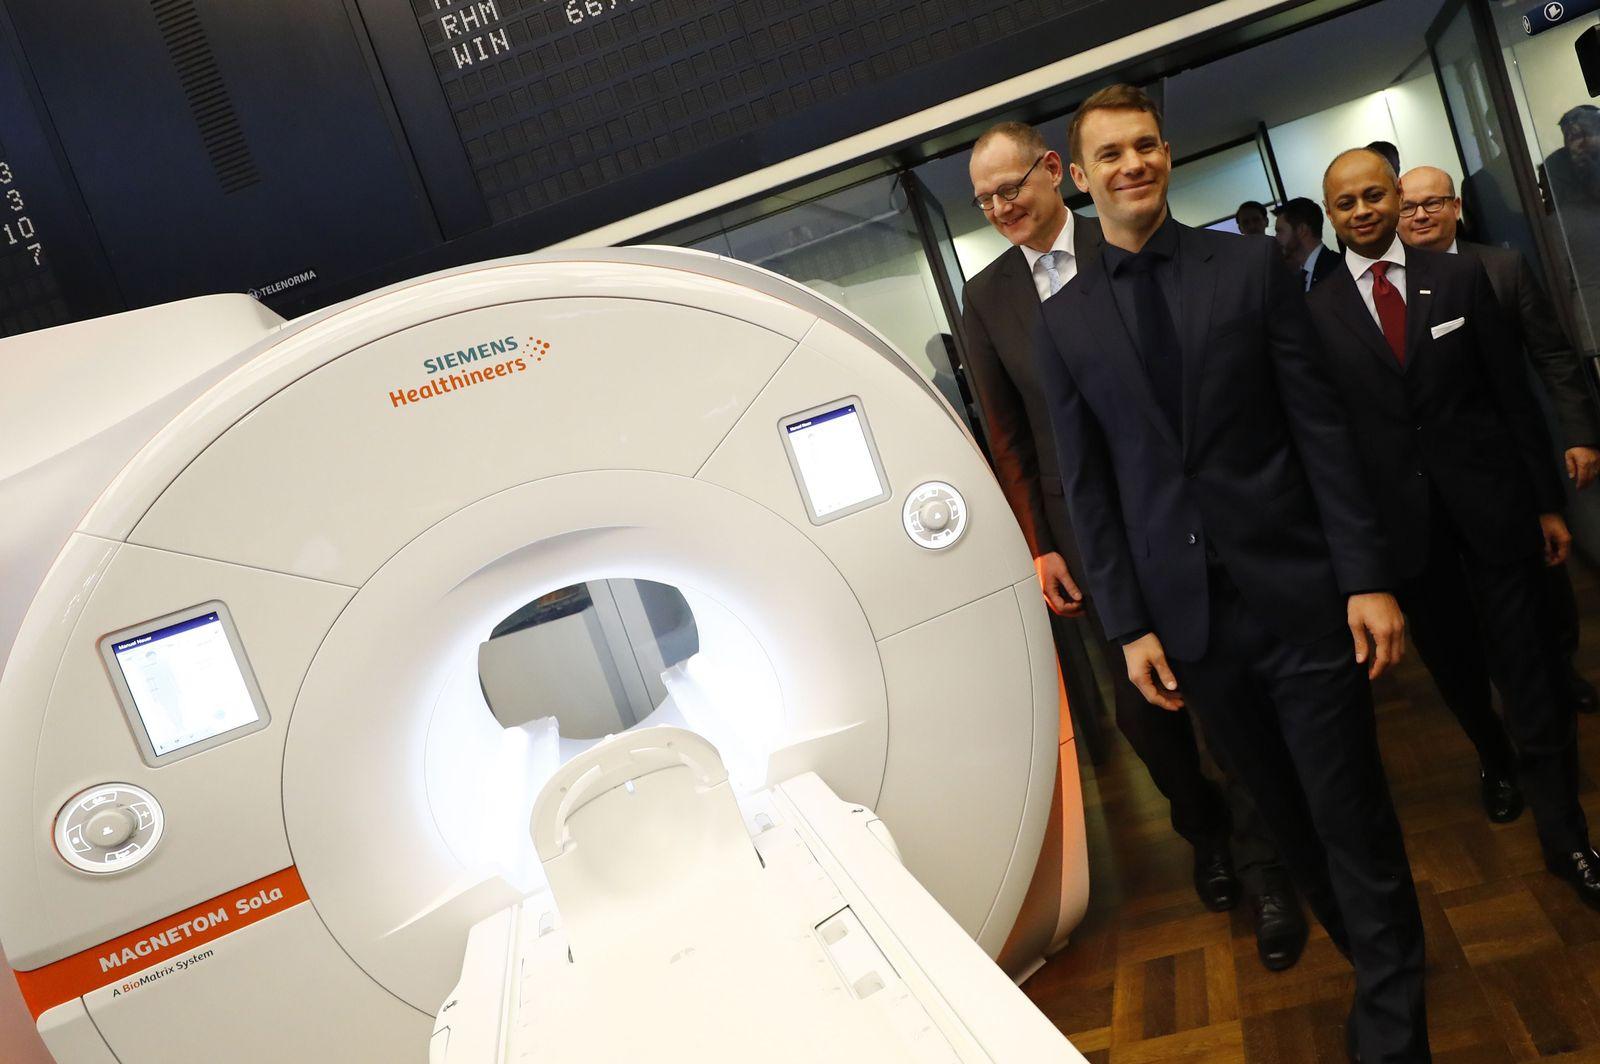 Manuel Neuer Siemens Börse